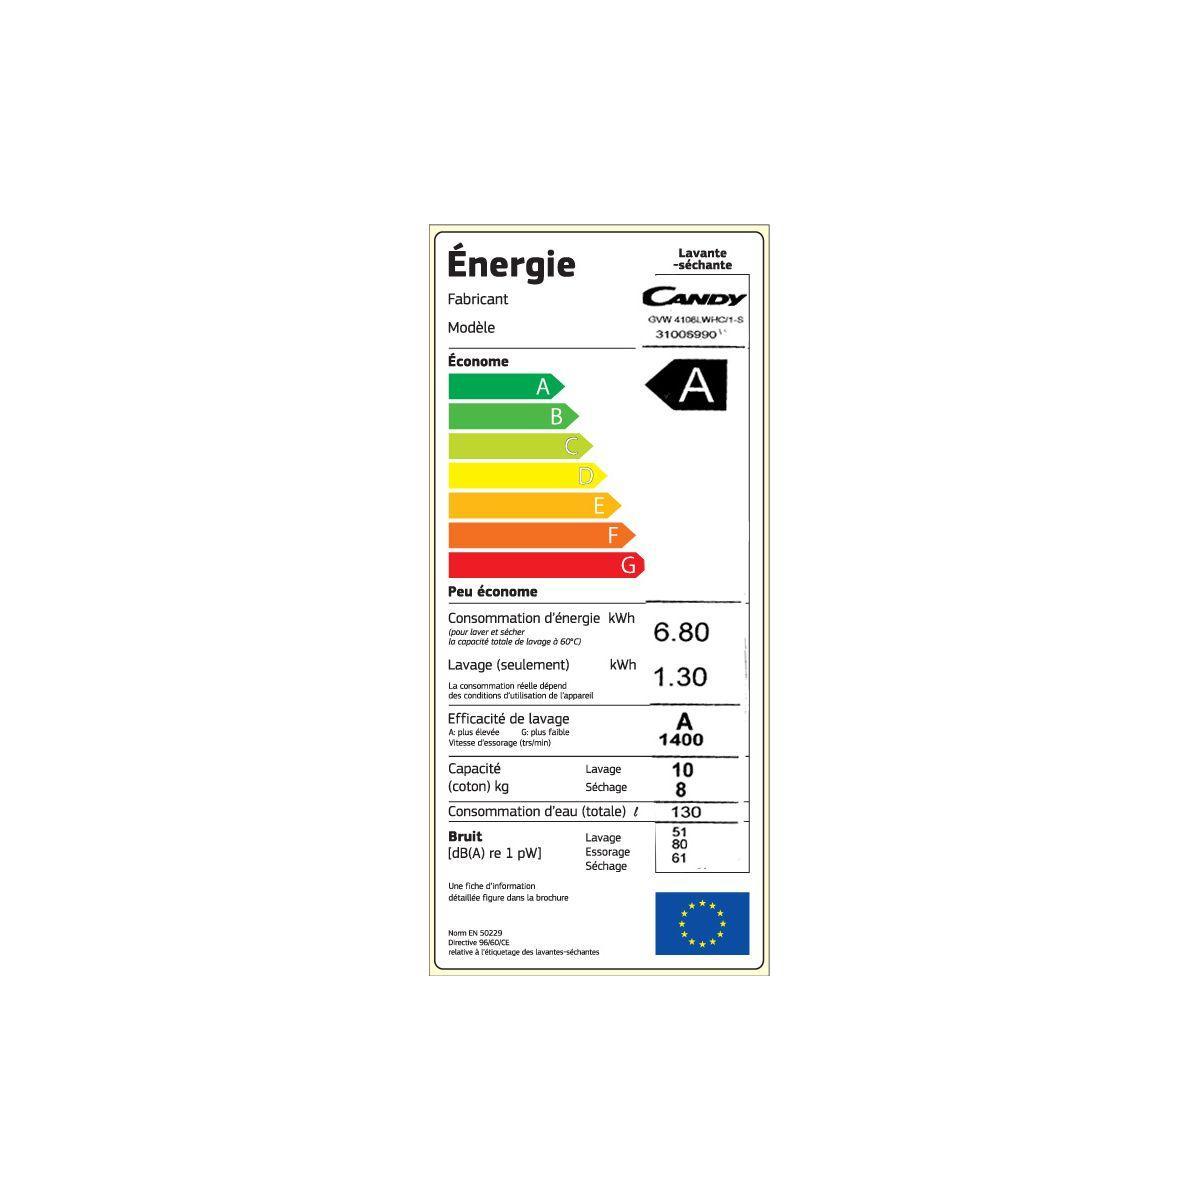 Lave-linge 60 cm Frontal Candy GVW 4108 WHC1-S